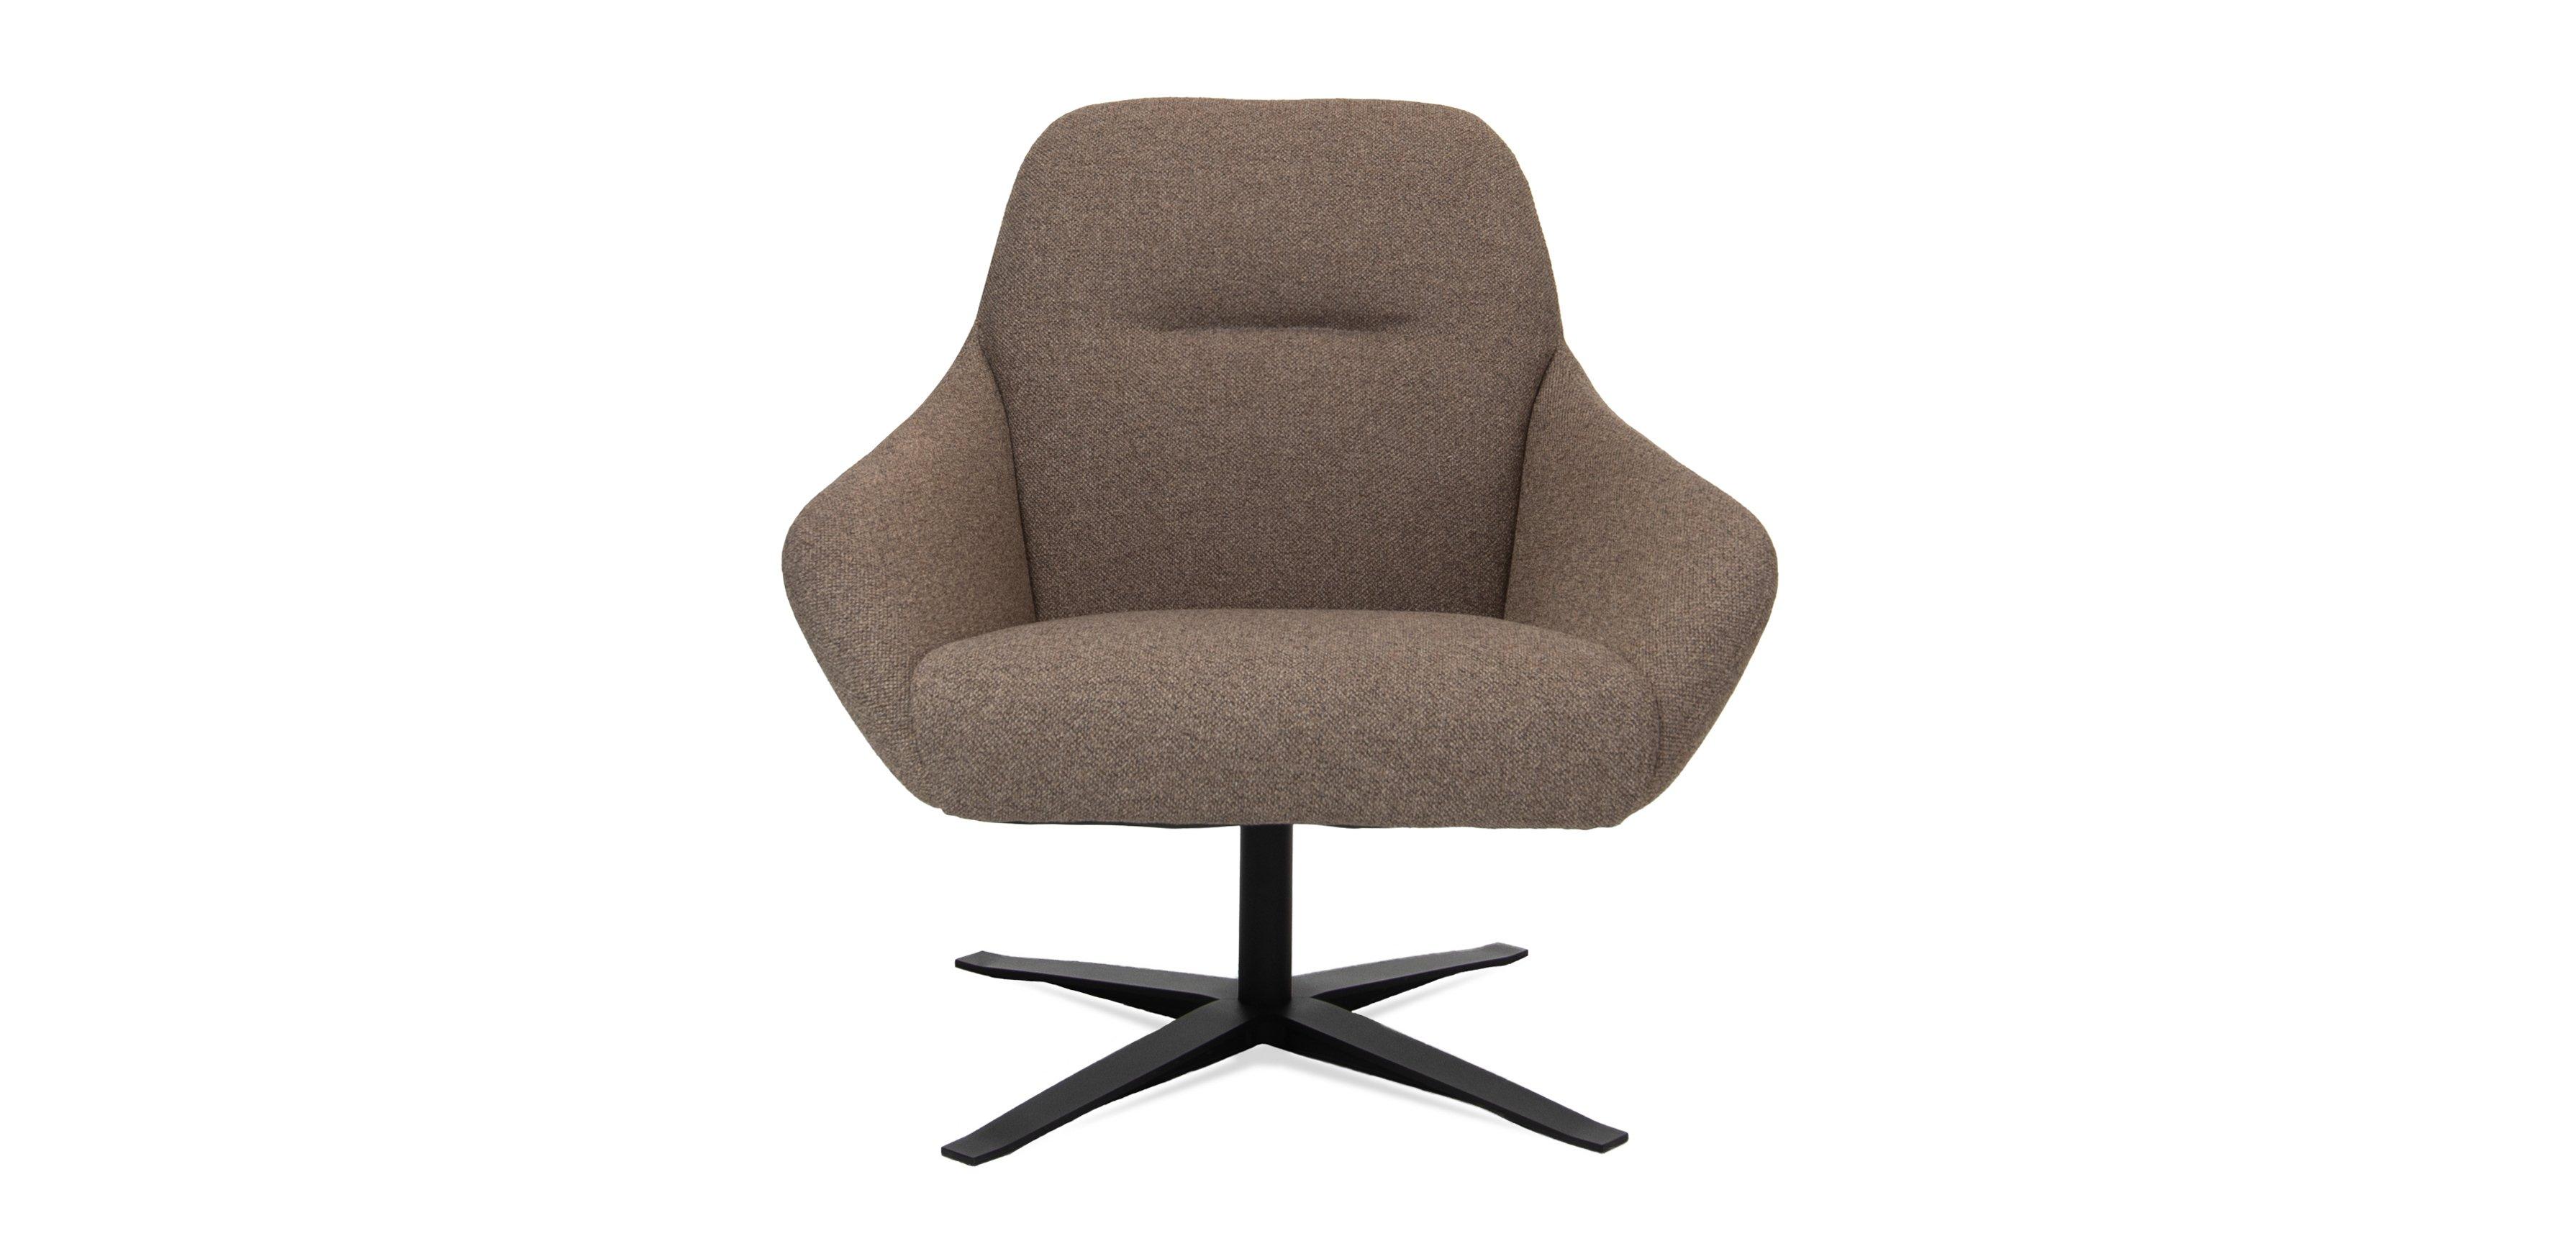 Python fauteuil DYYK 3580x1750 1